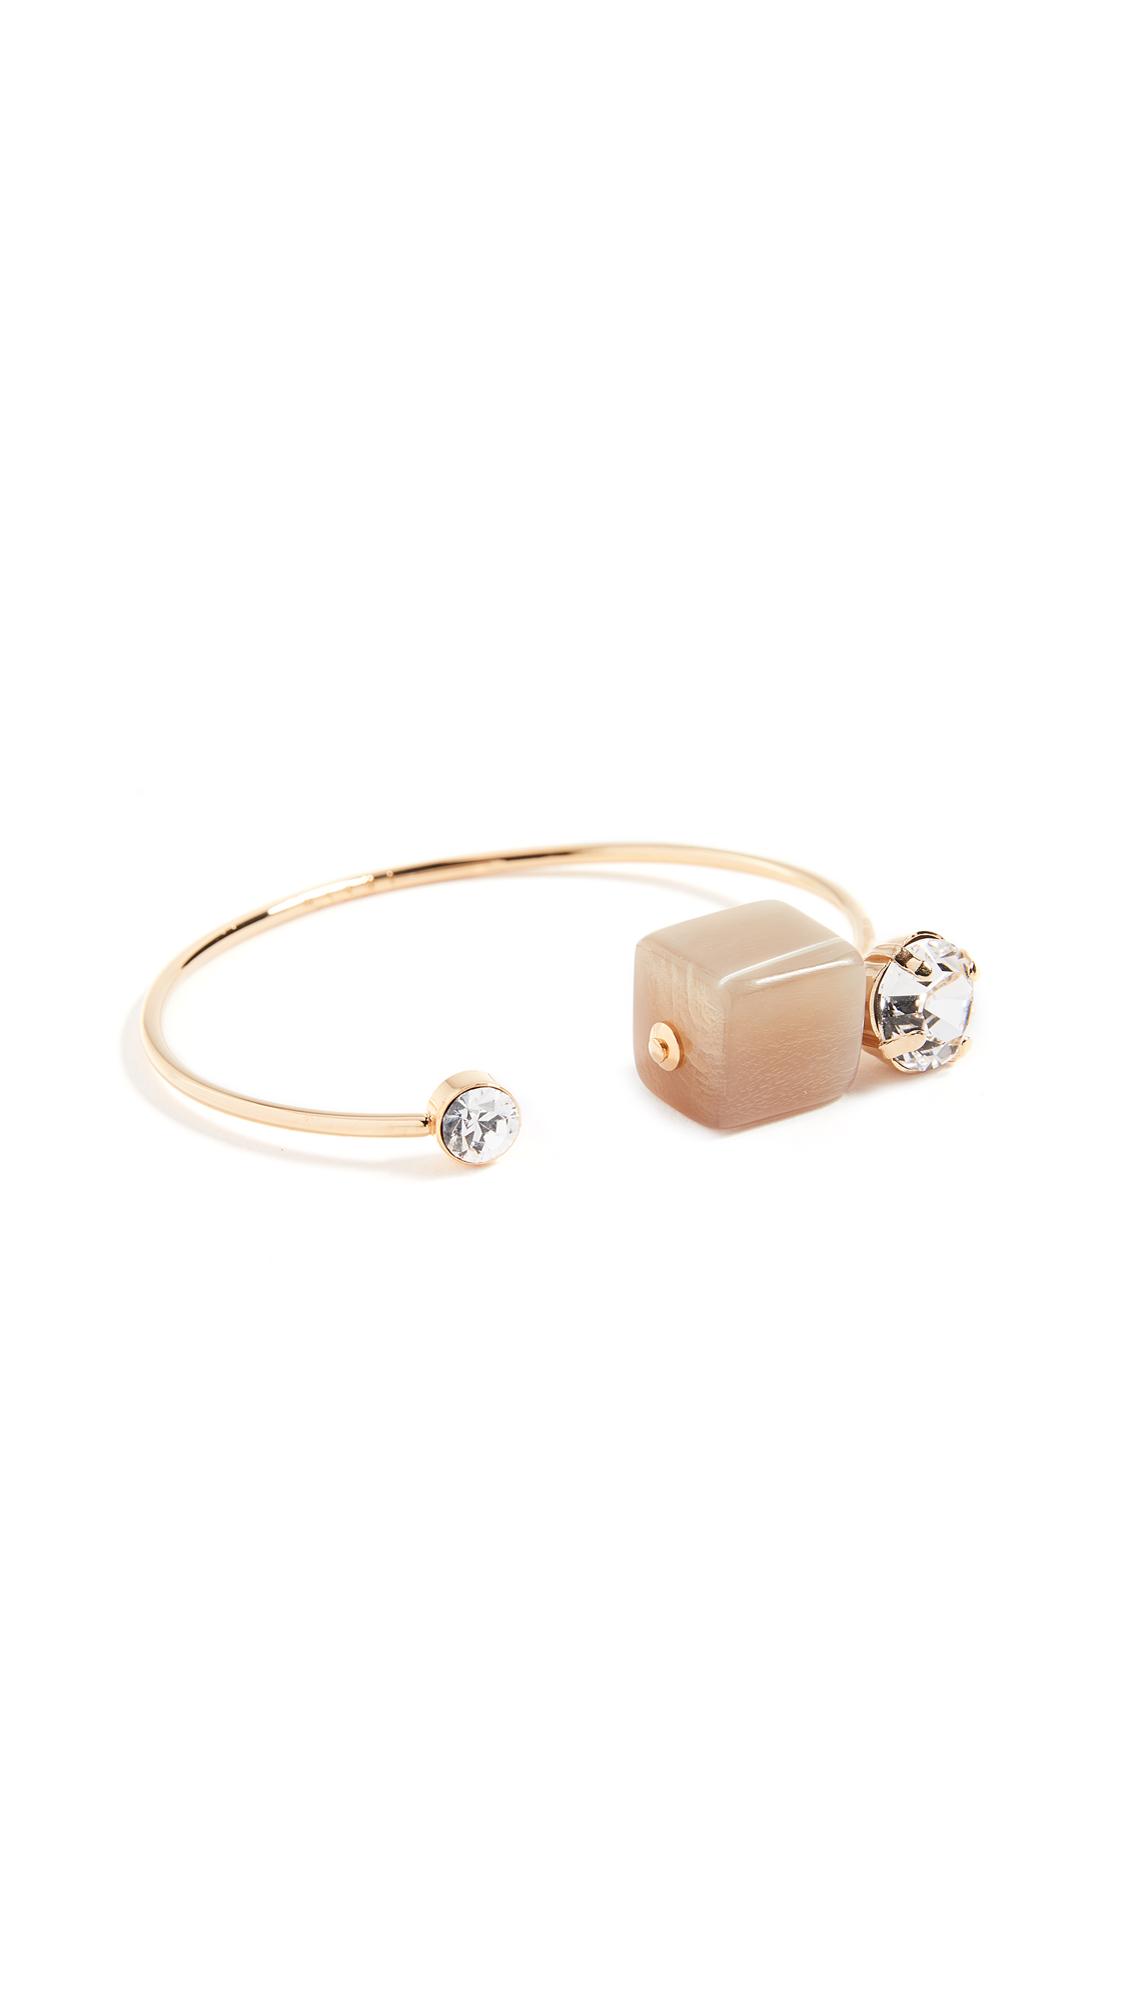 Marni Metal Horn Strass Bracelet - Pale Gold